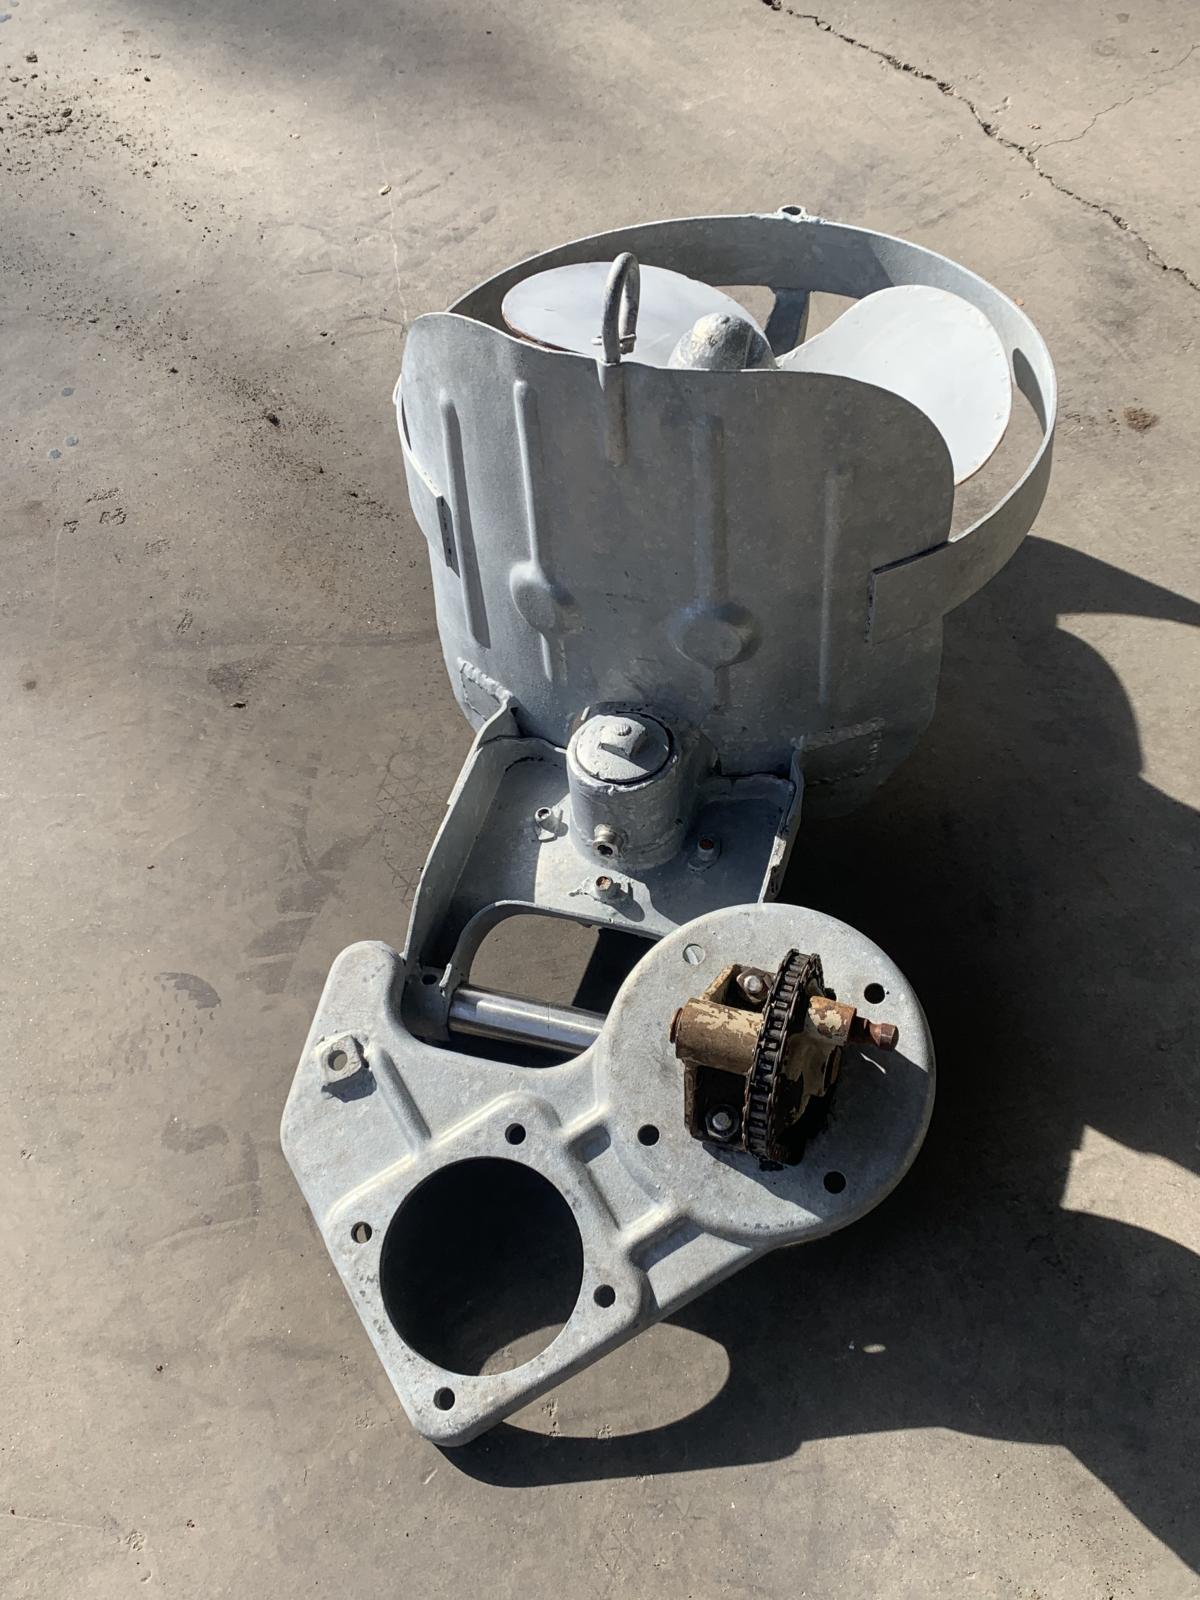 Propeller unit